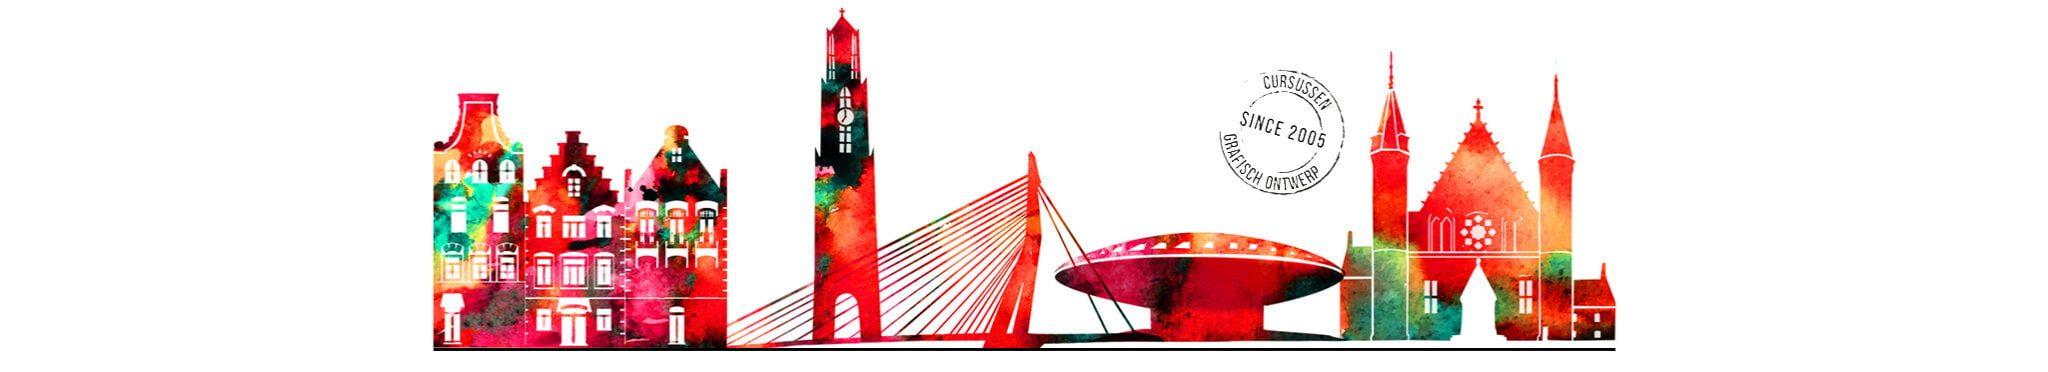 Cursussen Grafisch ontwerp Art City